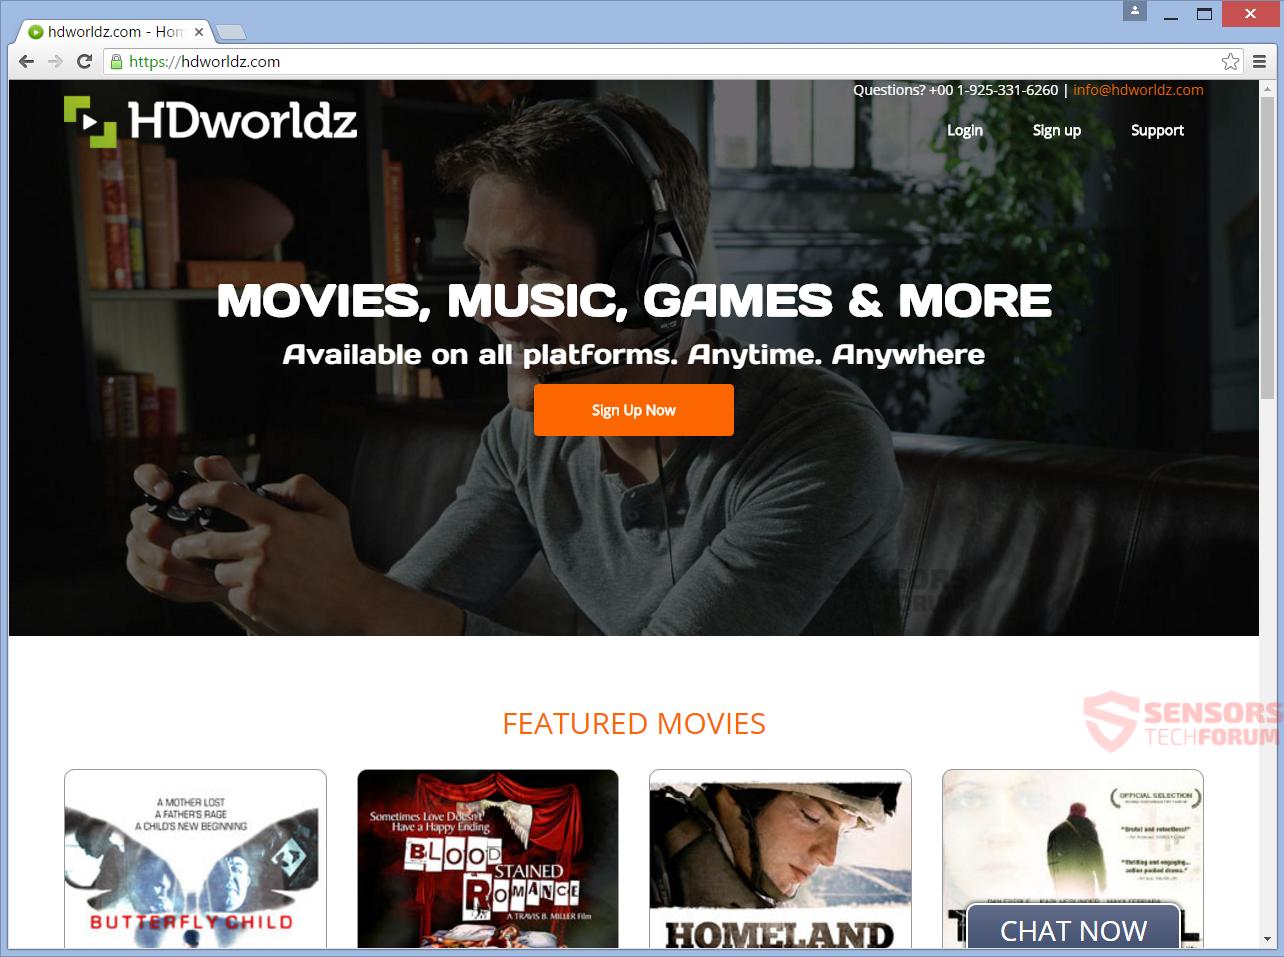 SensorsTechForum-hdworldz-com-hd-worldz-movies-games-music-adware-main-site